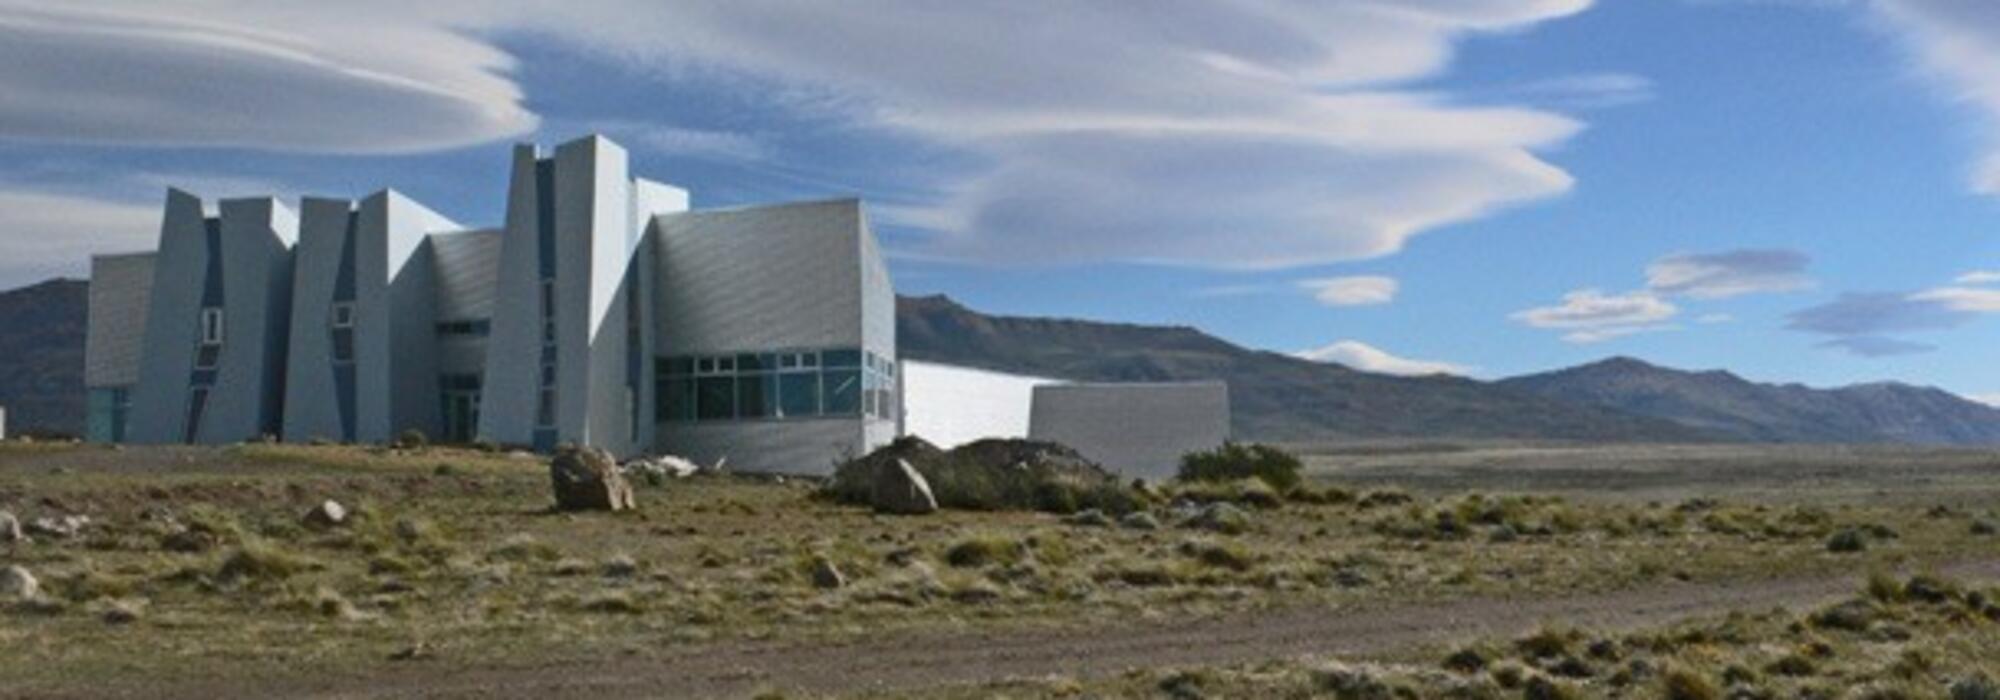 Музей Glaciarium